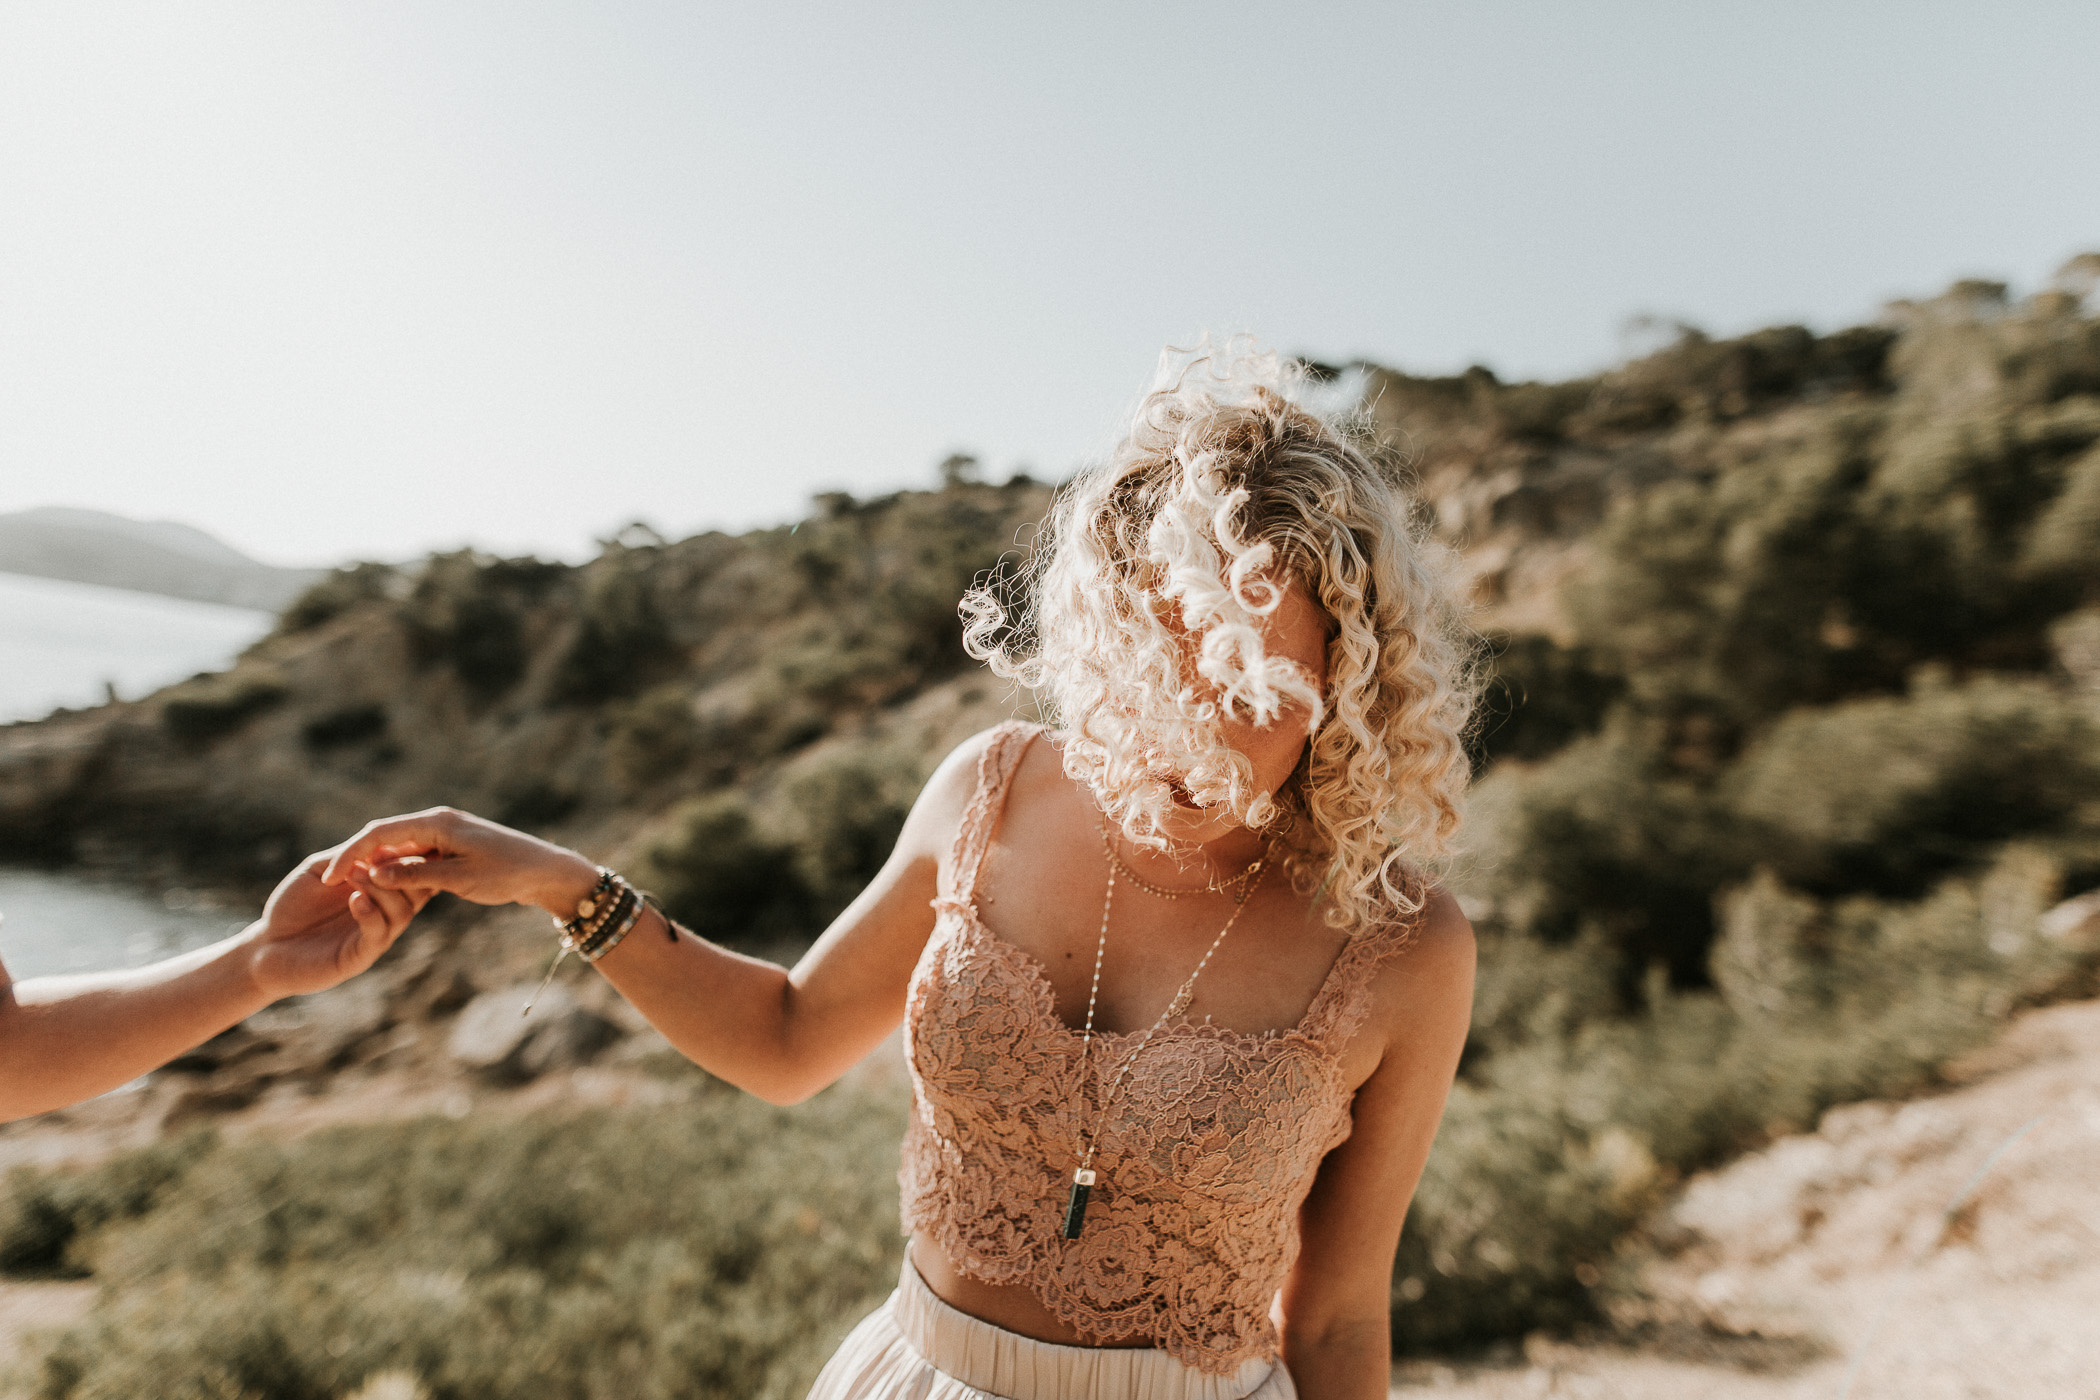 DanielaMarquardtPhotography_elopement_mallorca_spain_paguera_palma_charlyandbela_4